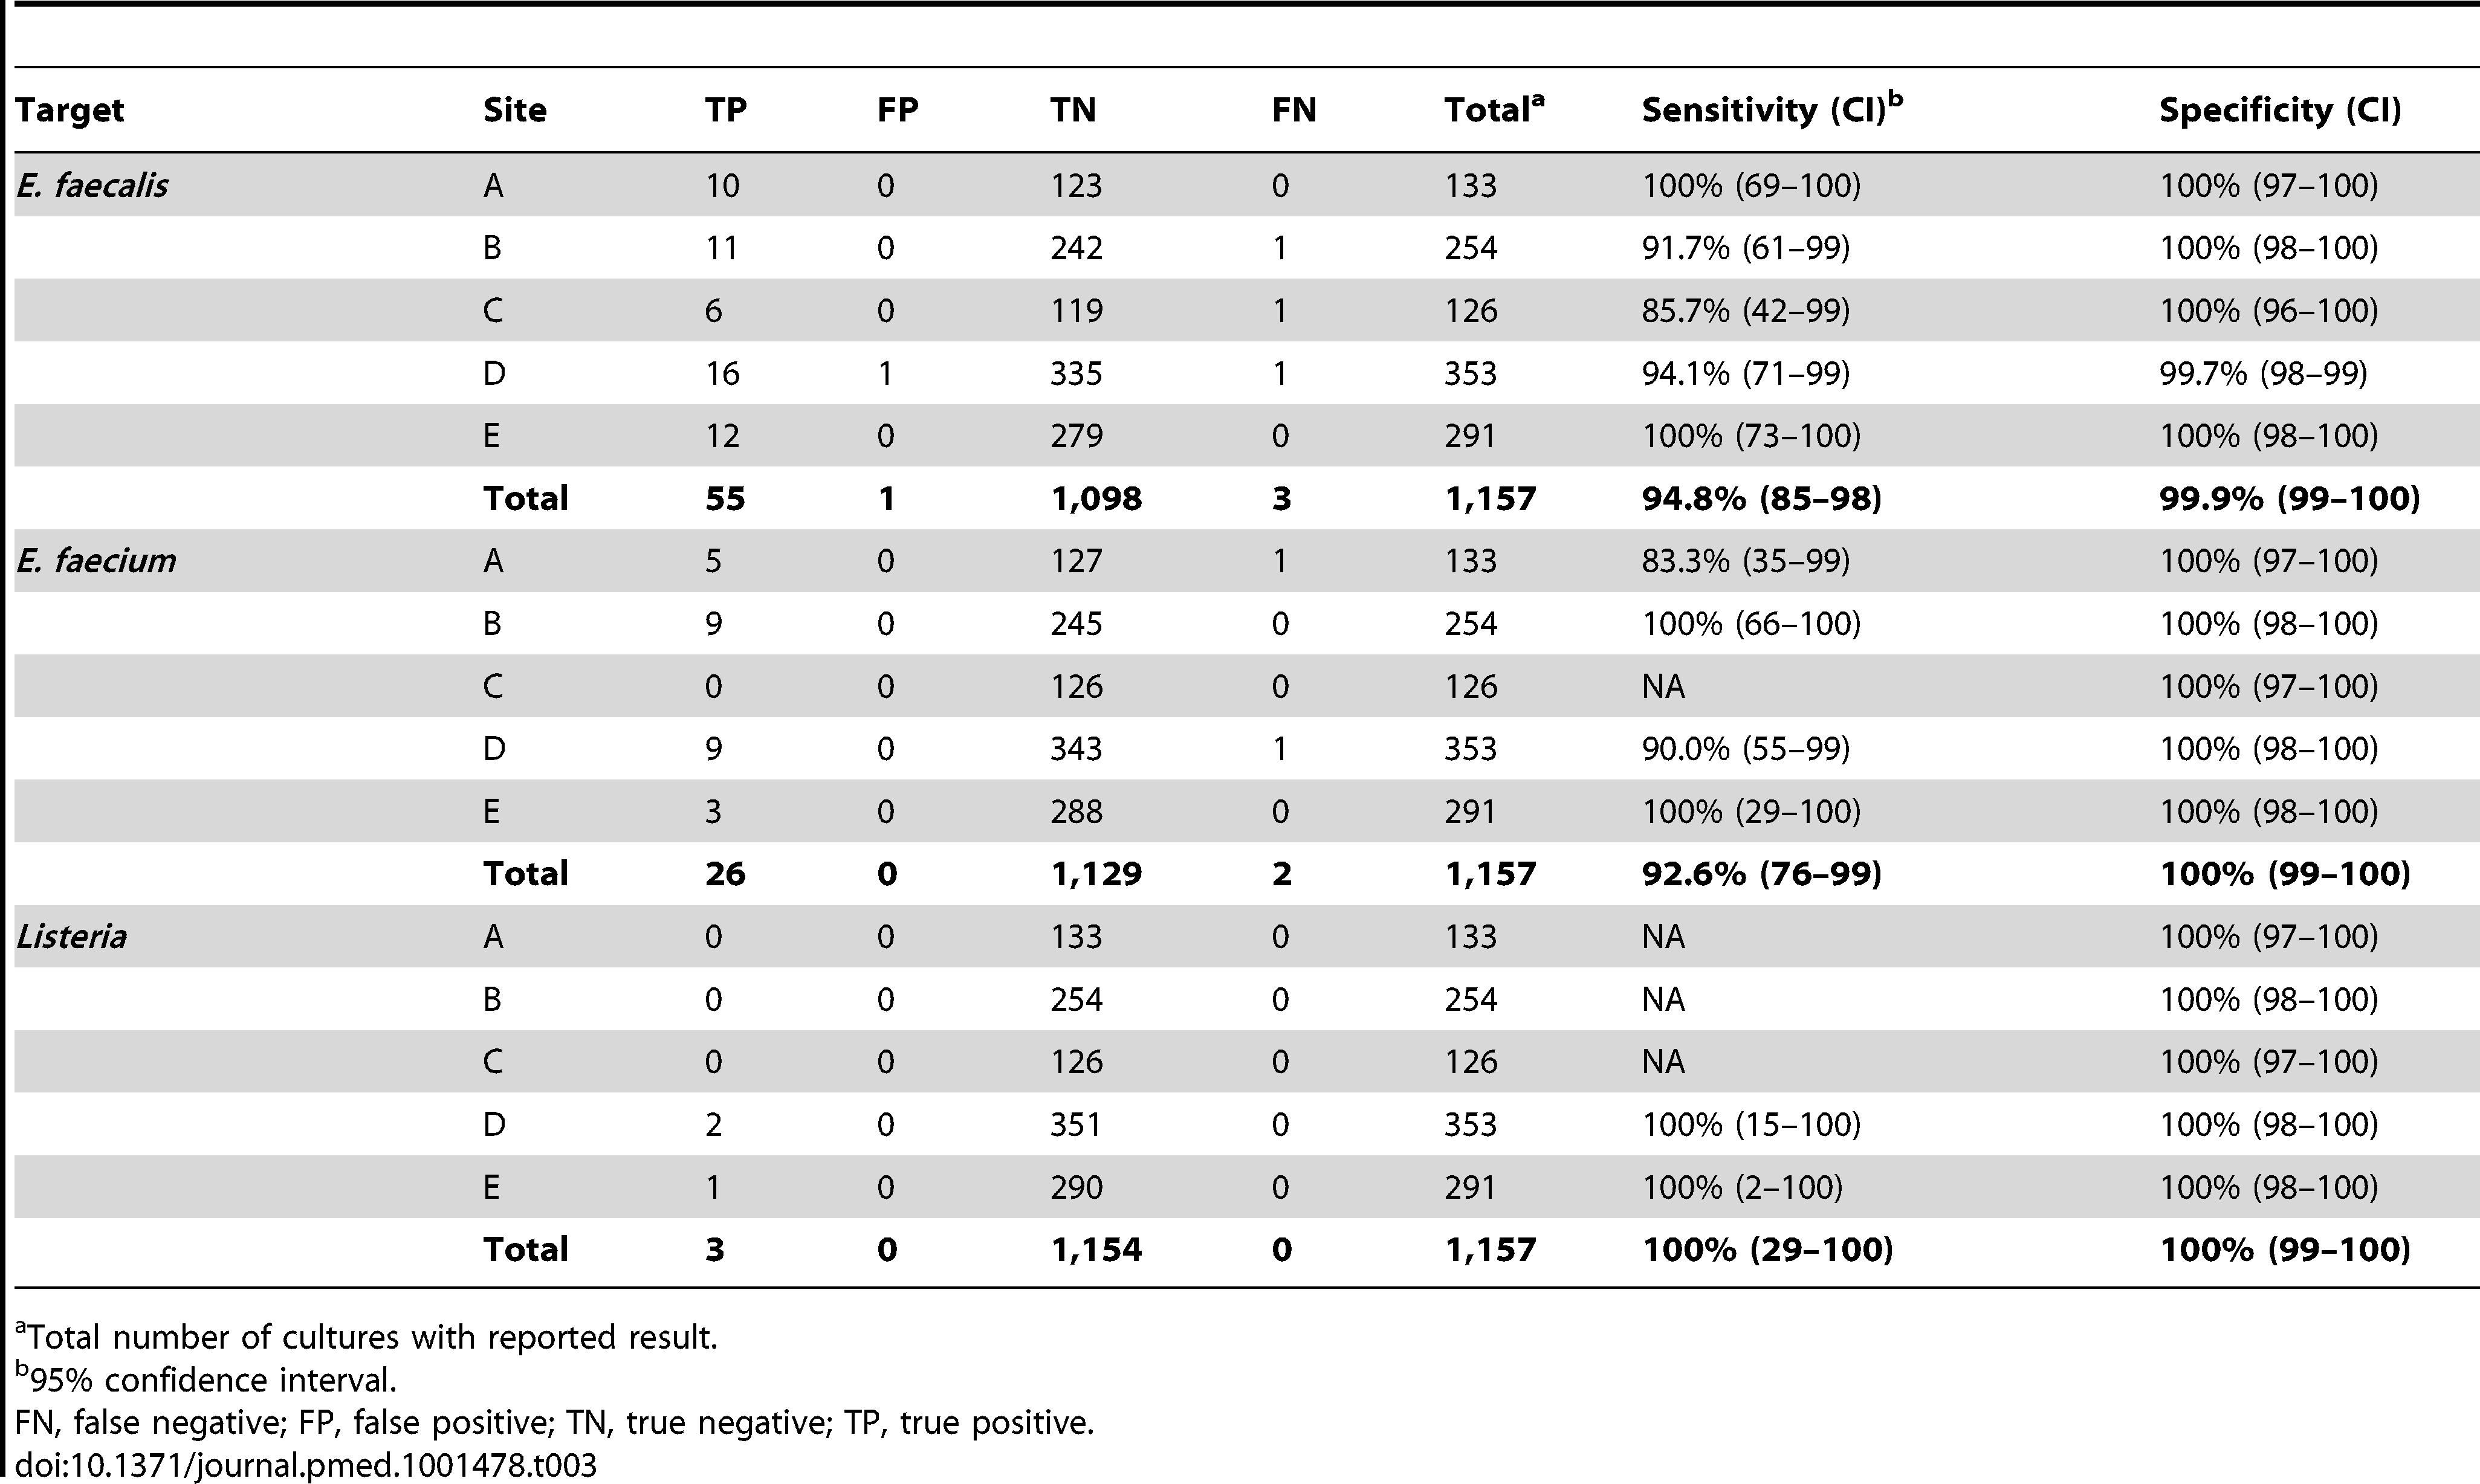 Detection of <i>E. faecalis</i>, <i>E. faecium</i>, and <i>Listeria</i> in prospectively collected monomicrobial blood cultures by Verigene BC-GP (<i>n=</i>1,157).